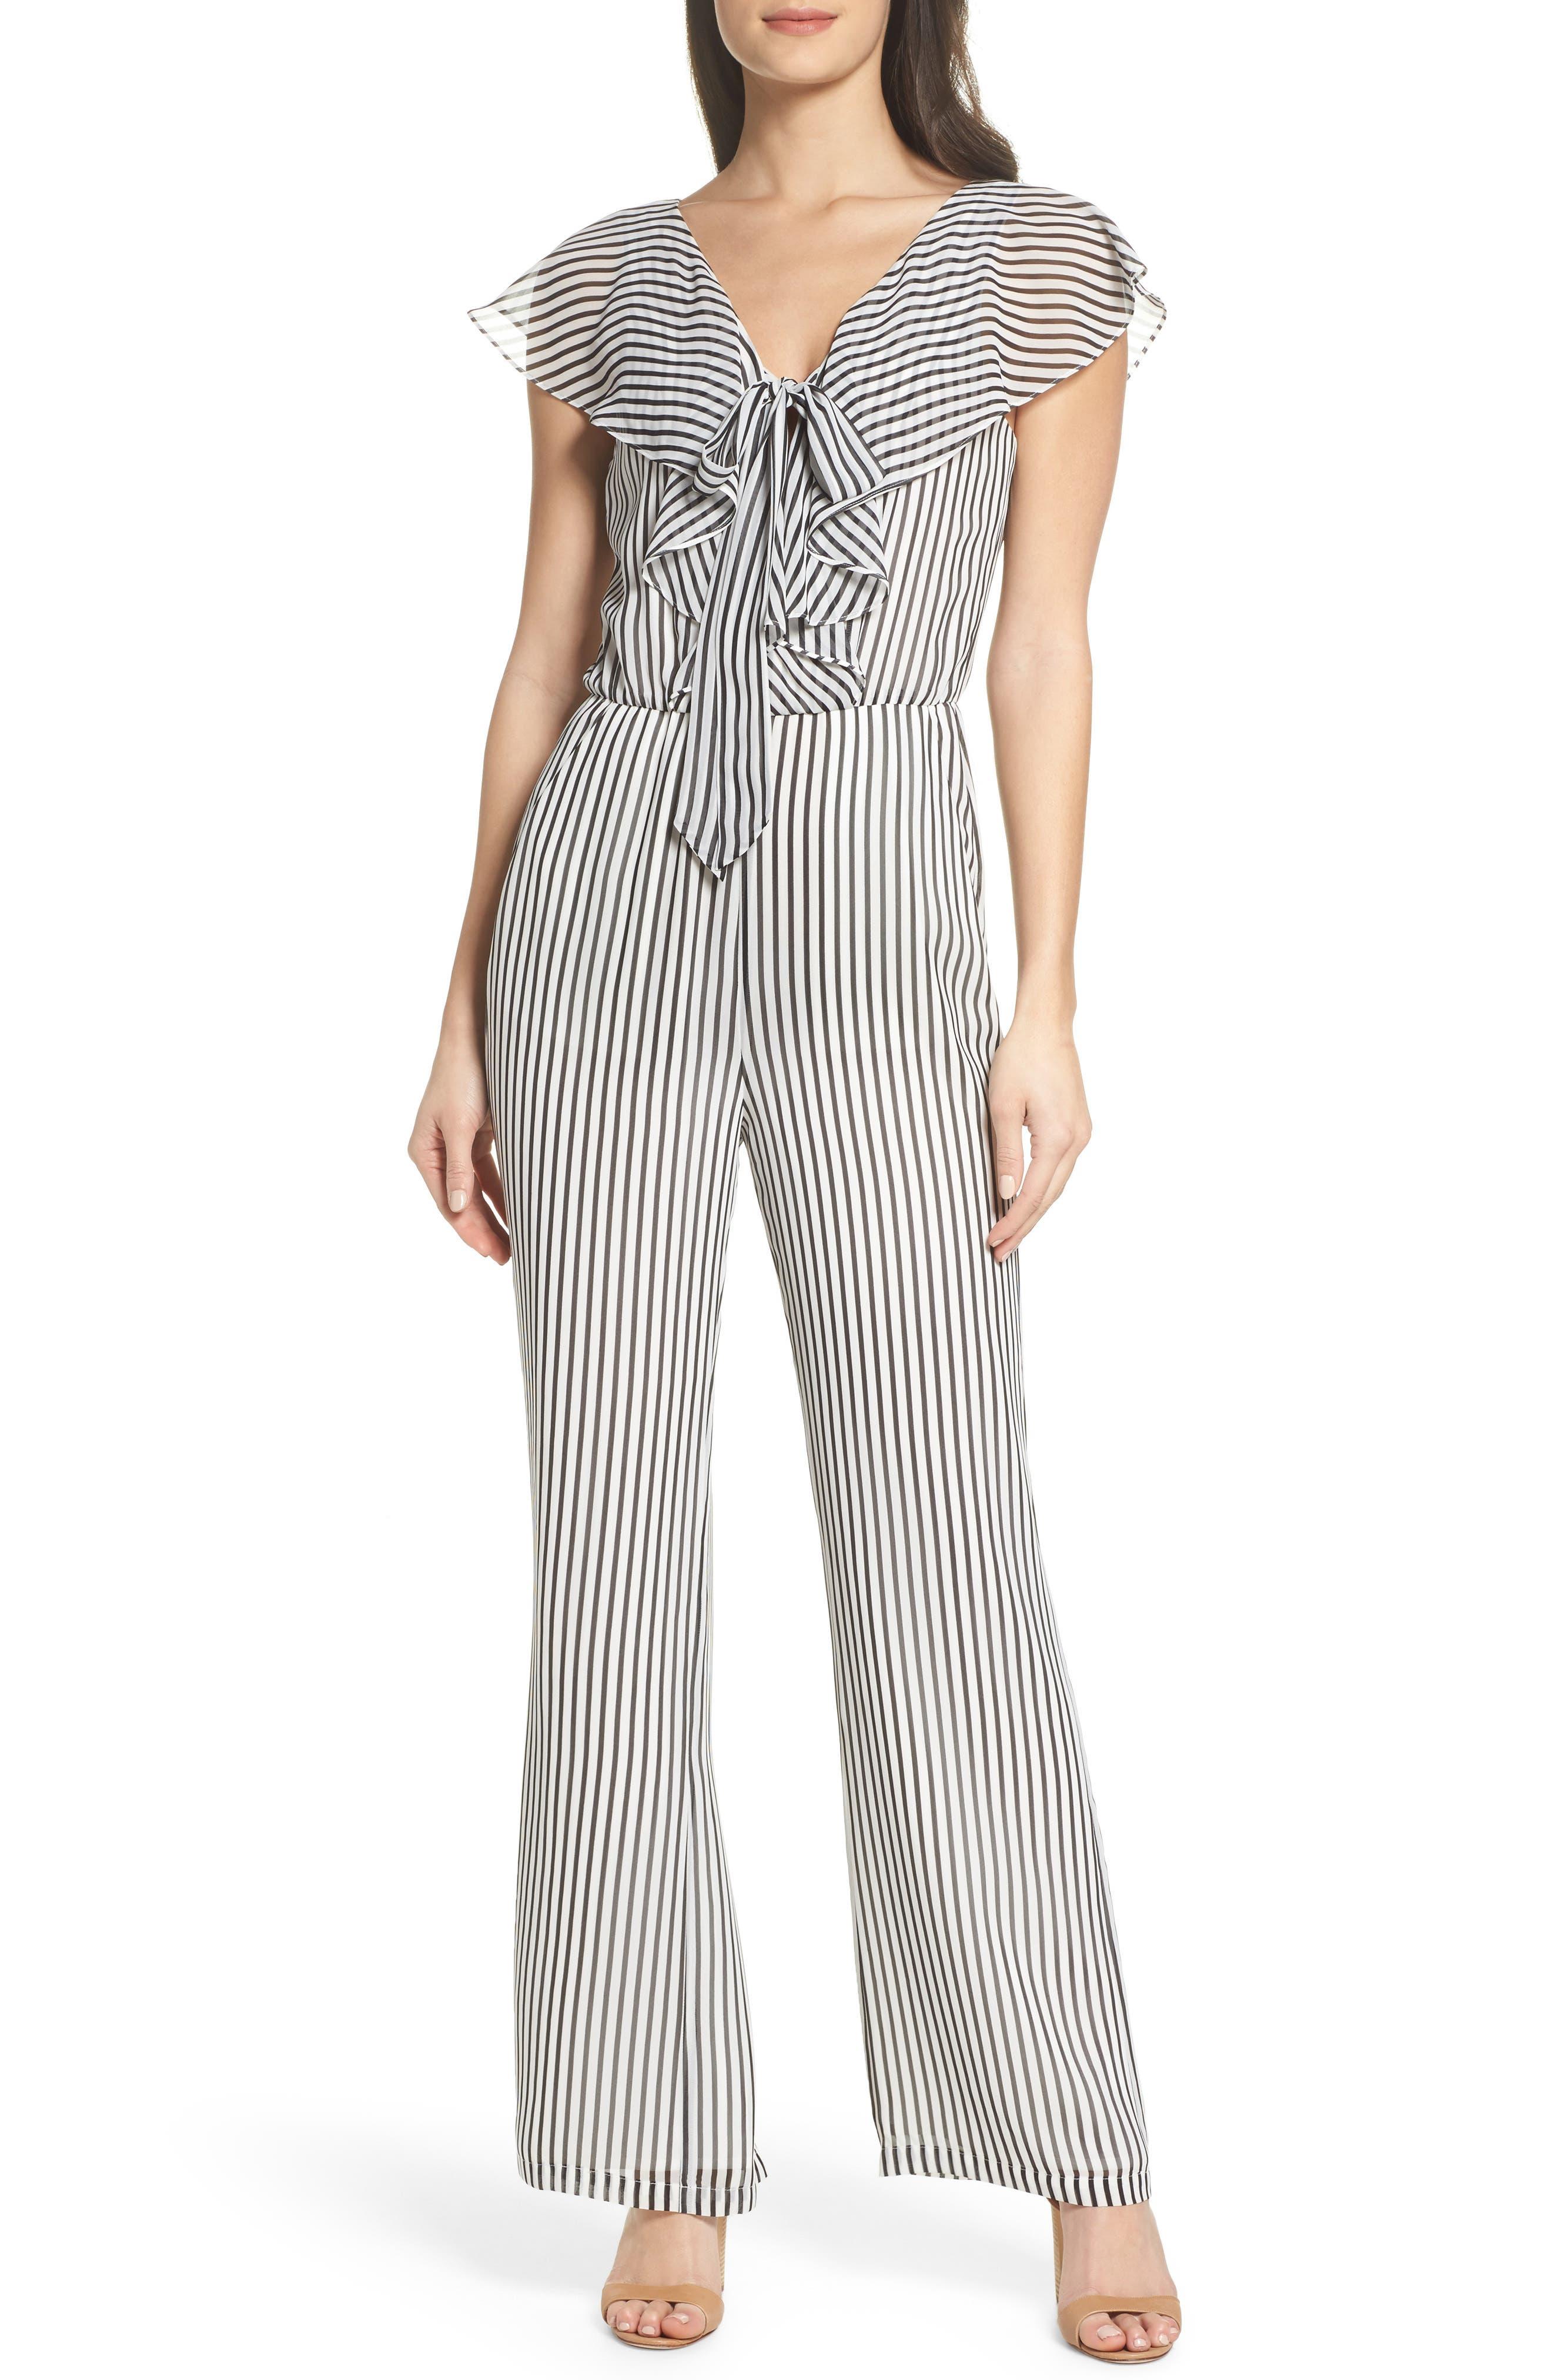 Cherry on Top Stripe Ruffle Jumpsuit,                             Main thumbnail 1, color,                             Black/ White Stripe